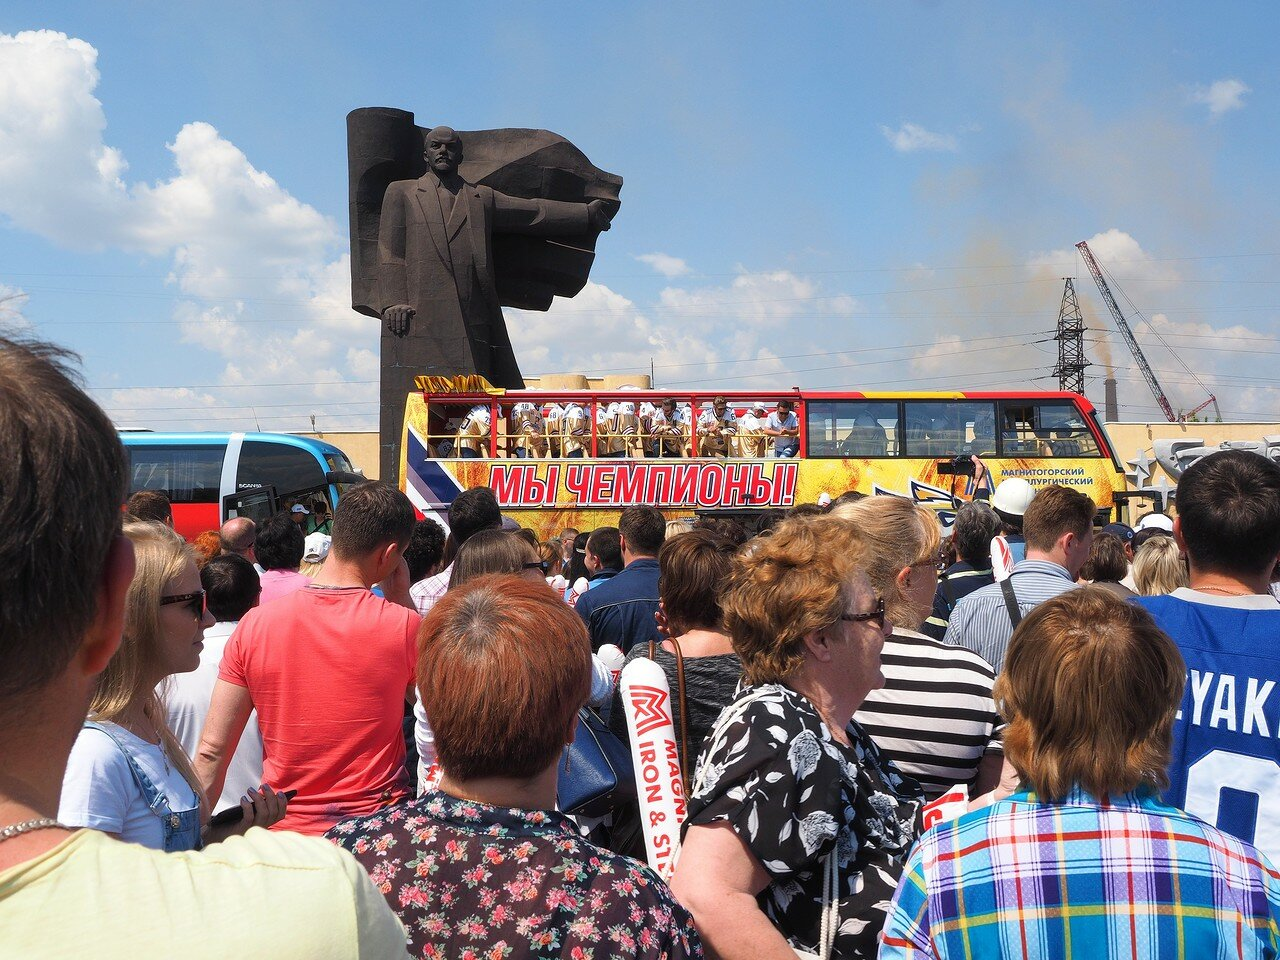 106Церемония чествования команды Металлург27.05.2016